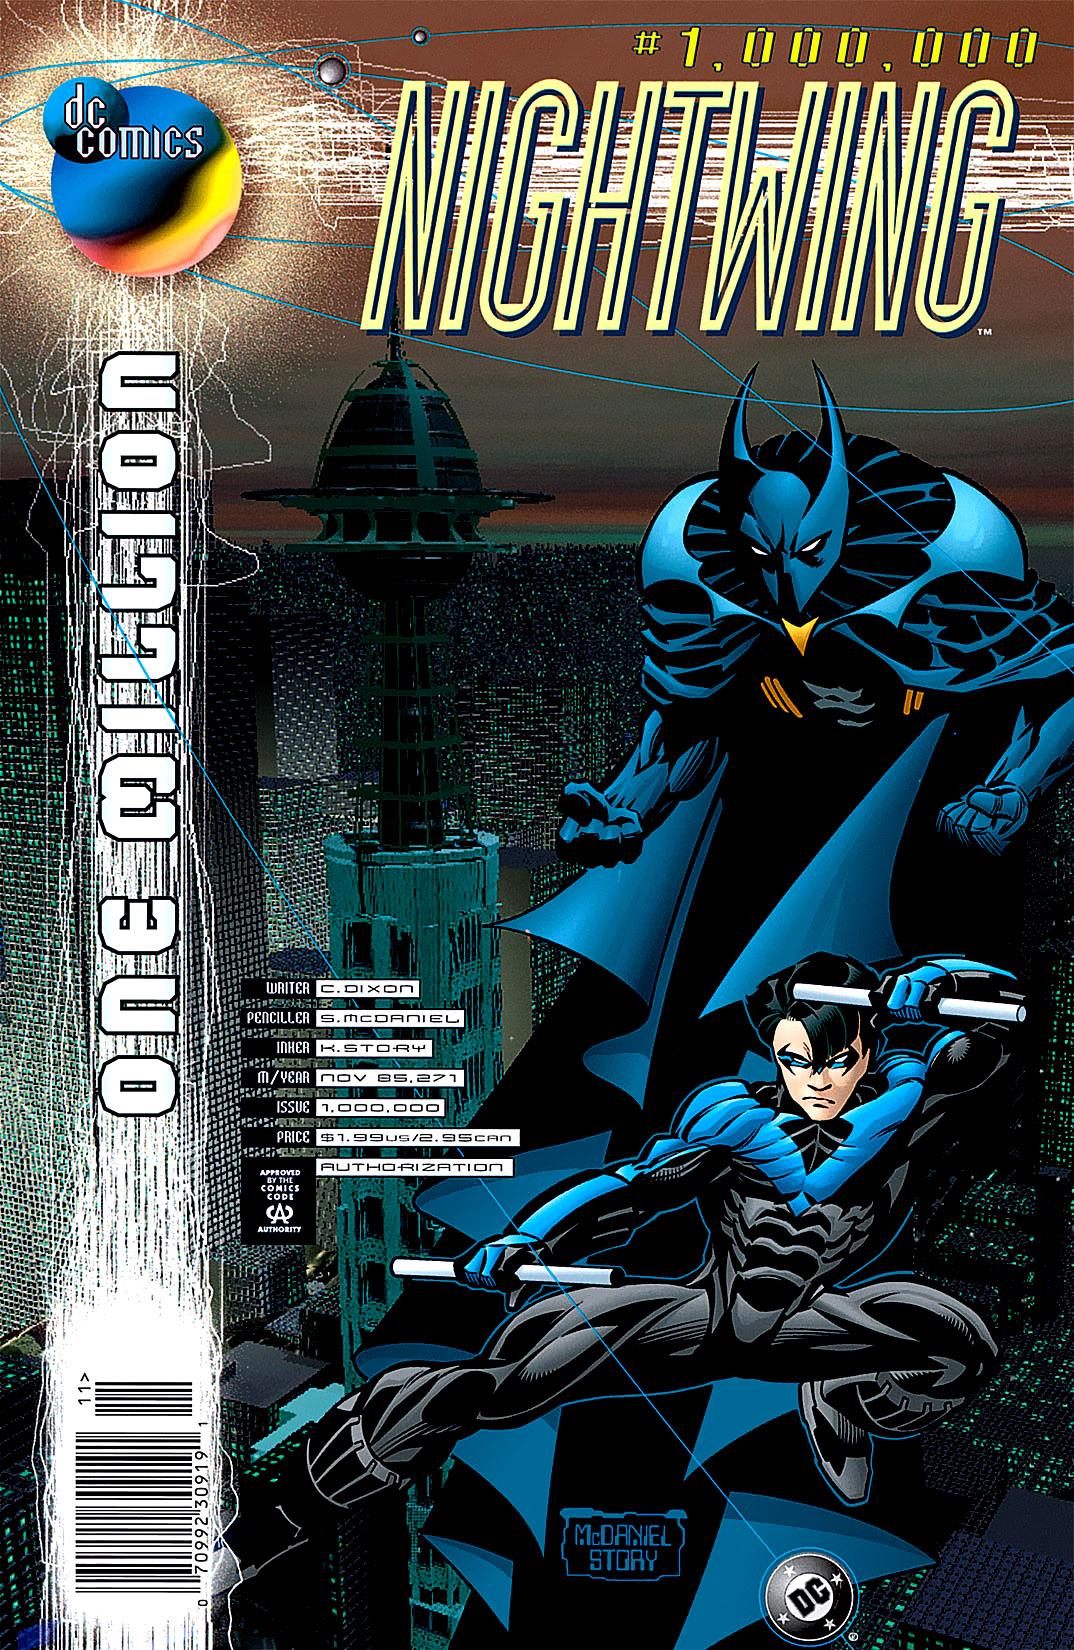 Nightwing (1996) chap 1000000 pic 1